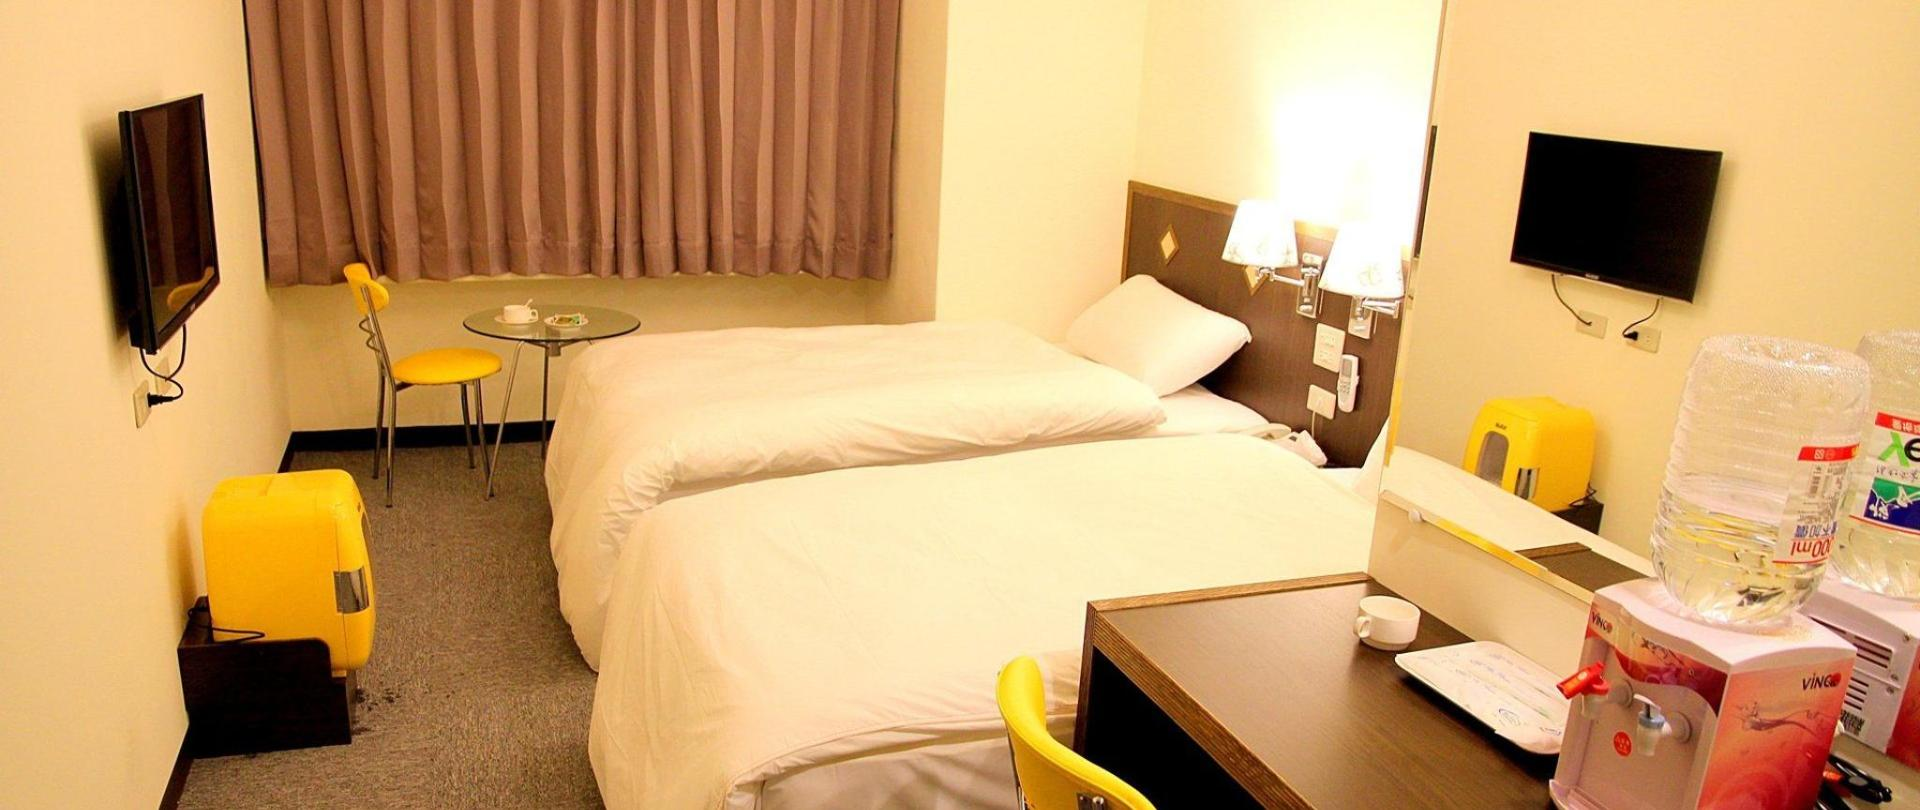 melodyhotel-room3.jpg